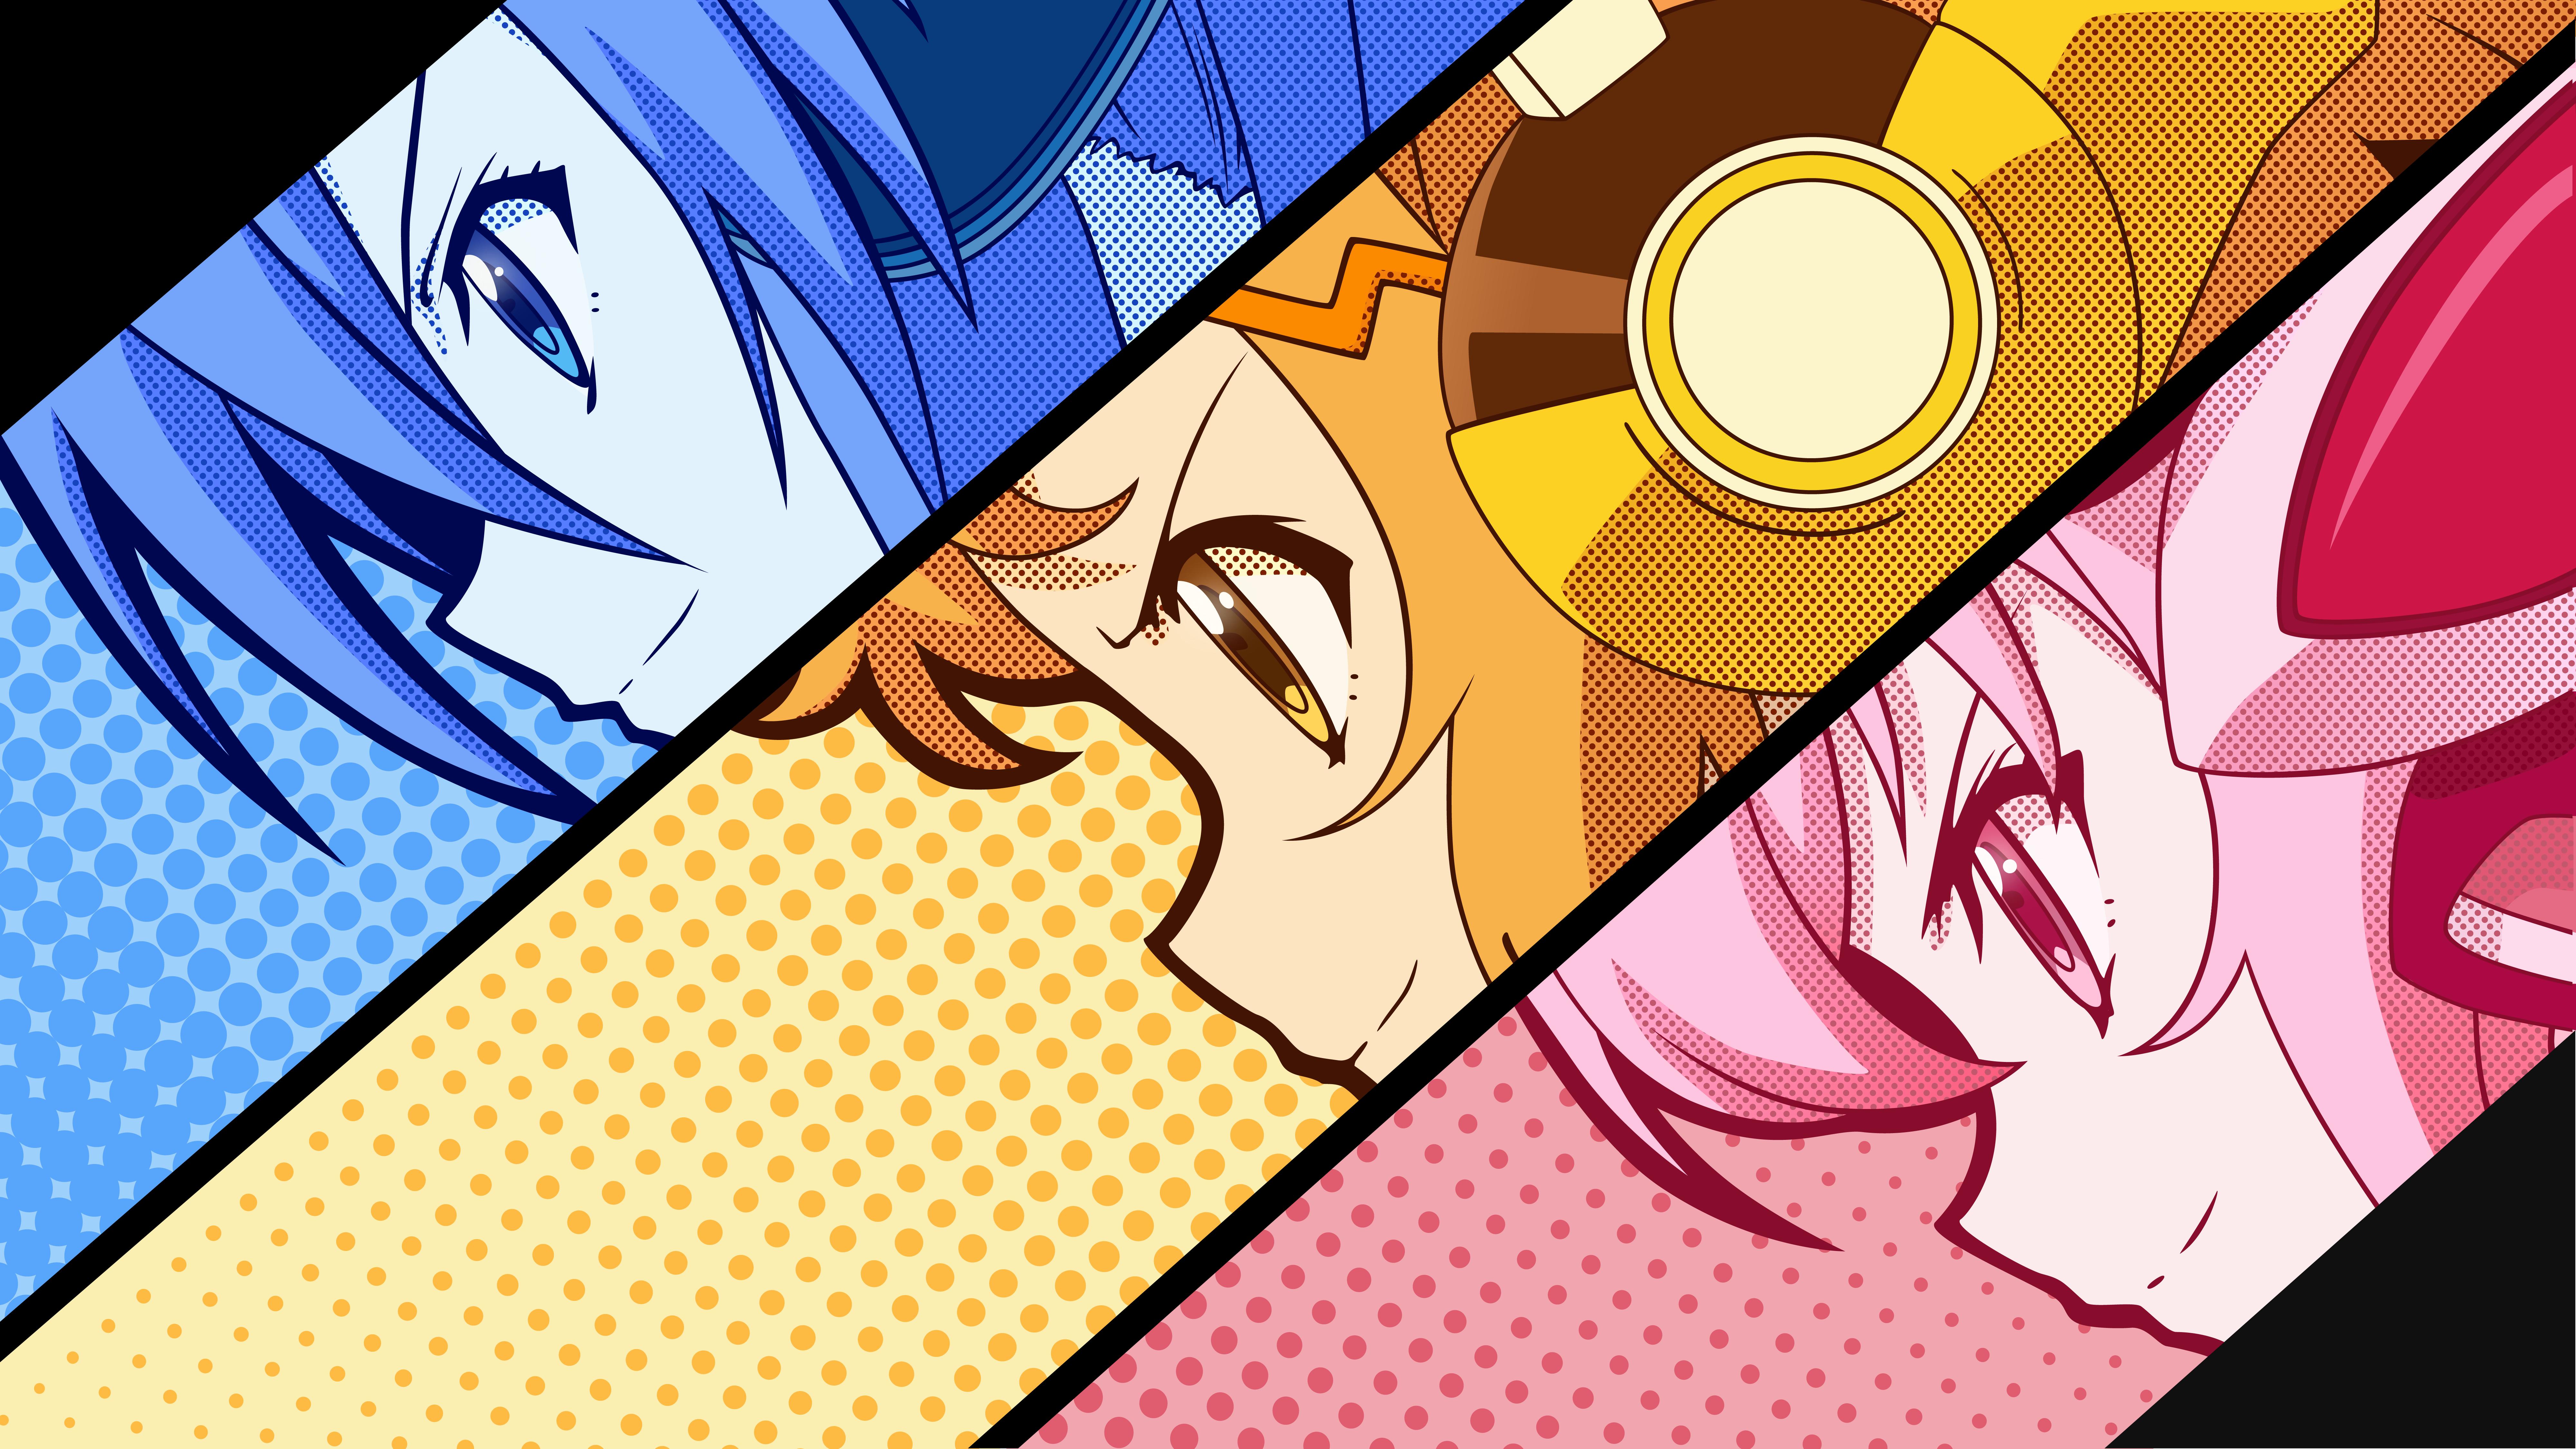 Illustration Digital Art Anime Anime Girls Collage Manga Cartoon Comics Vector Art Senki Zesshou Symphogear Kazanari